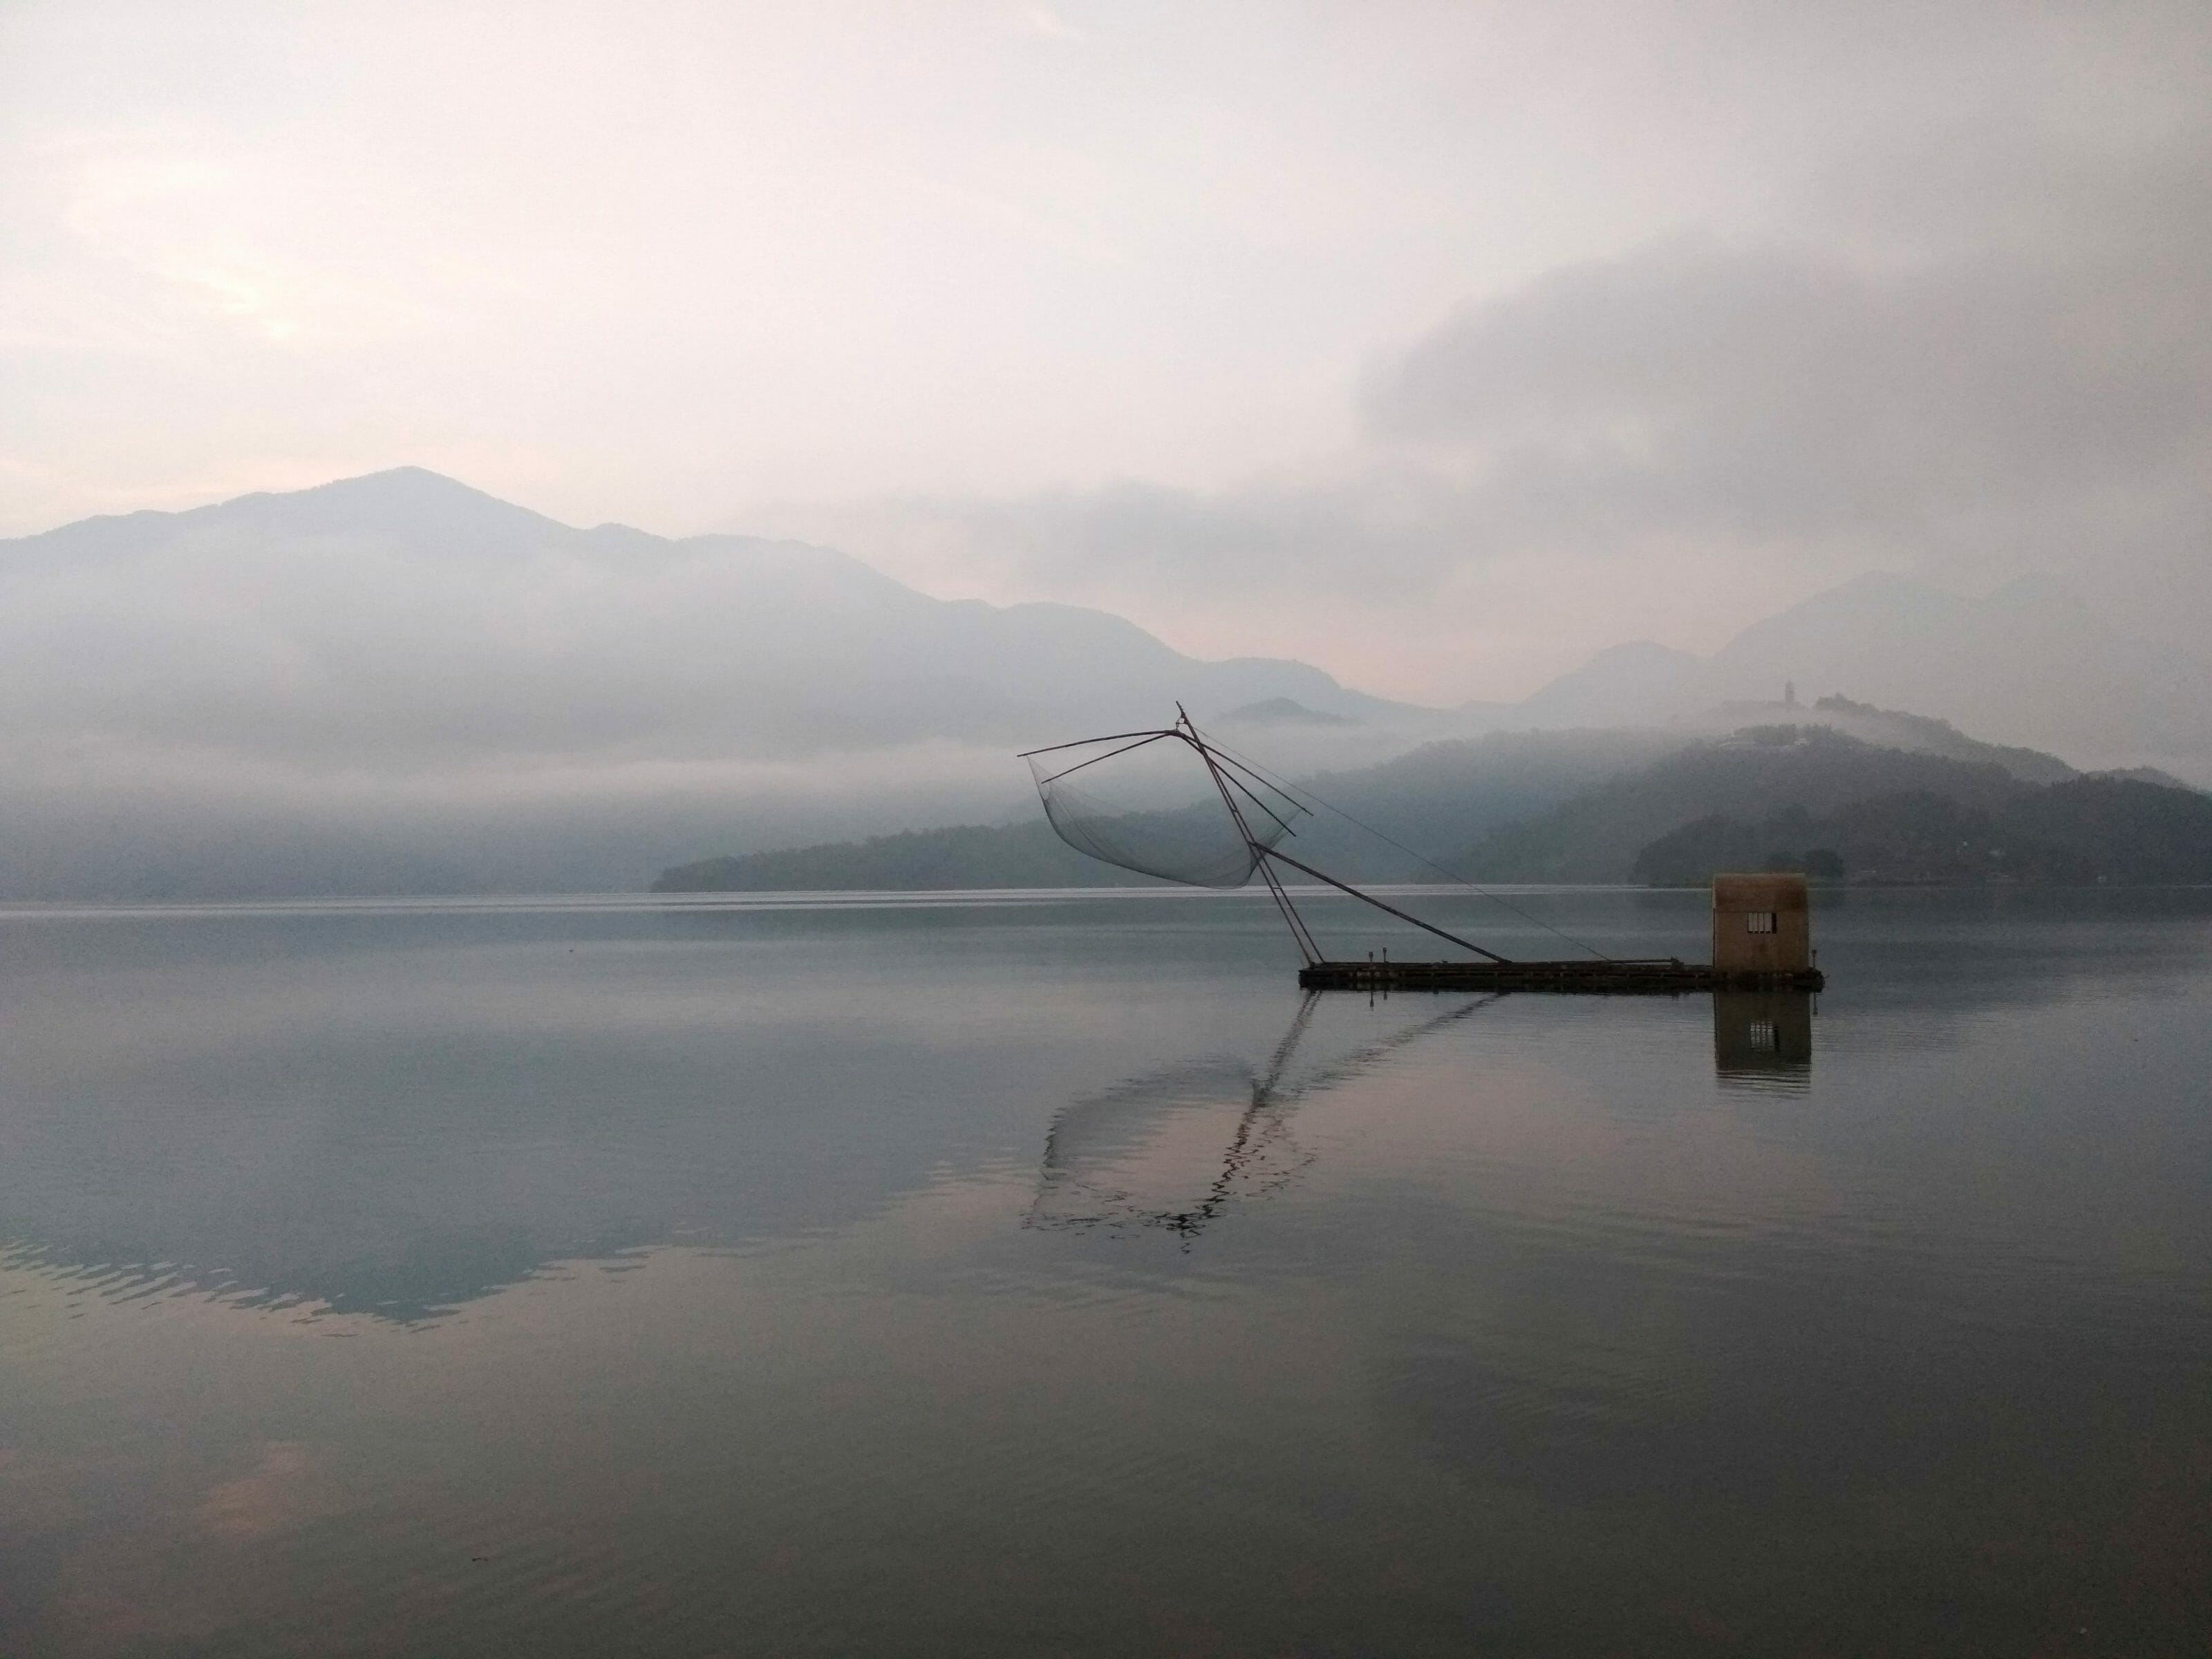 le sun moon lake de Taiwan tour du monde